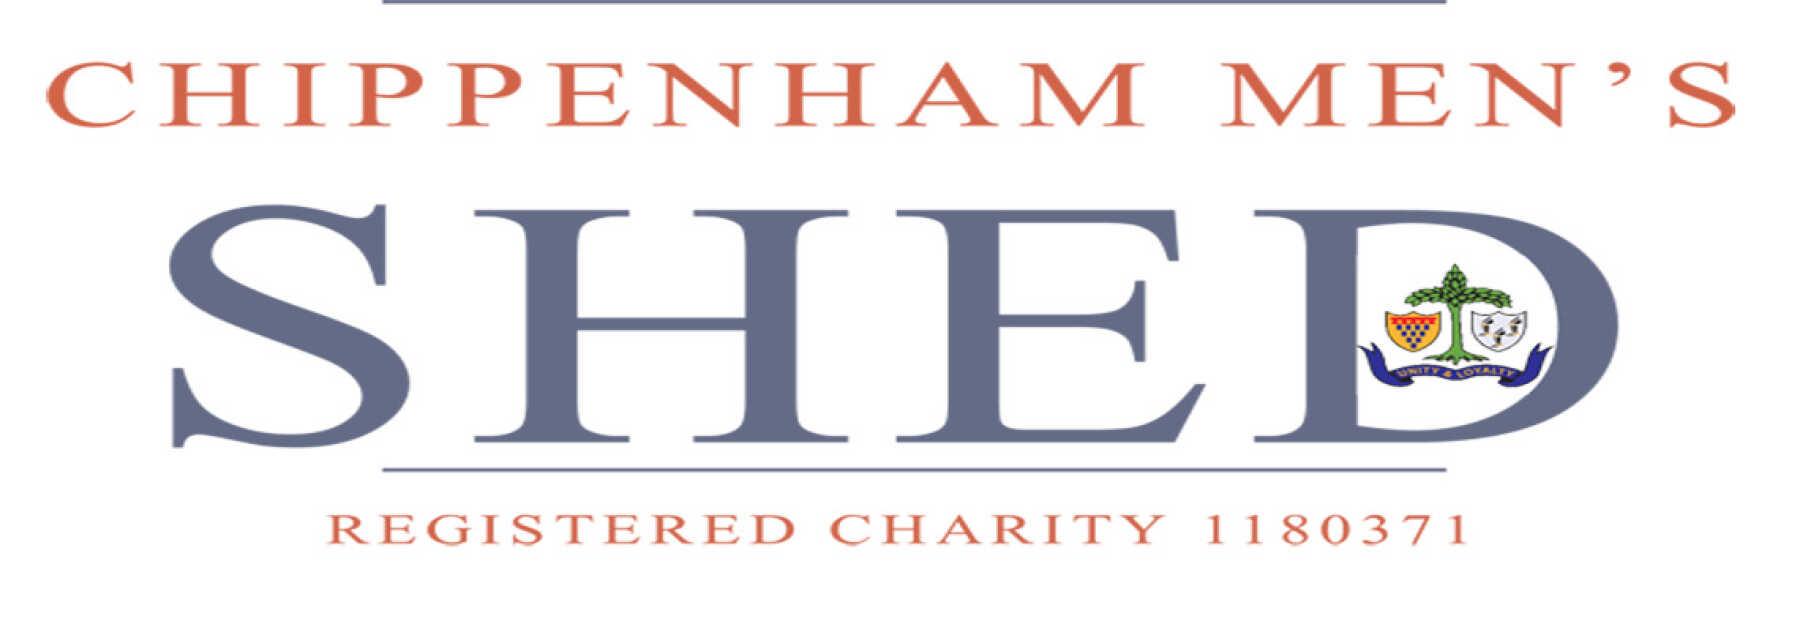 Featured Image for Chippenham Men's Shed (CIO)